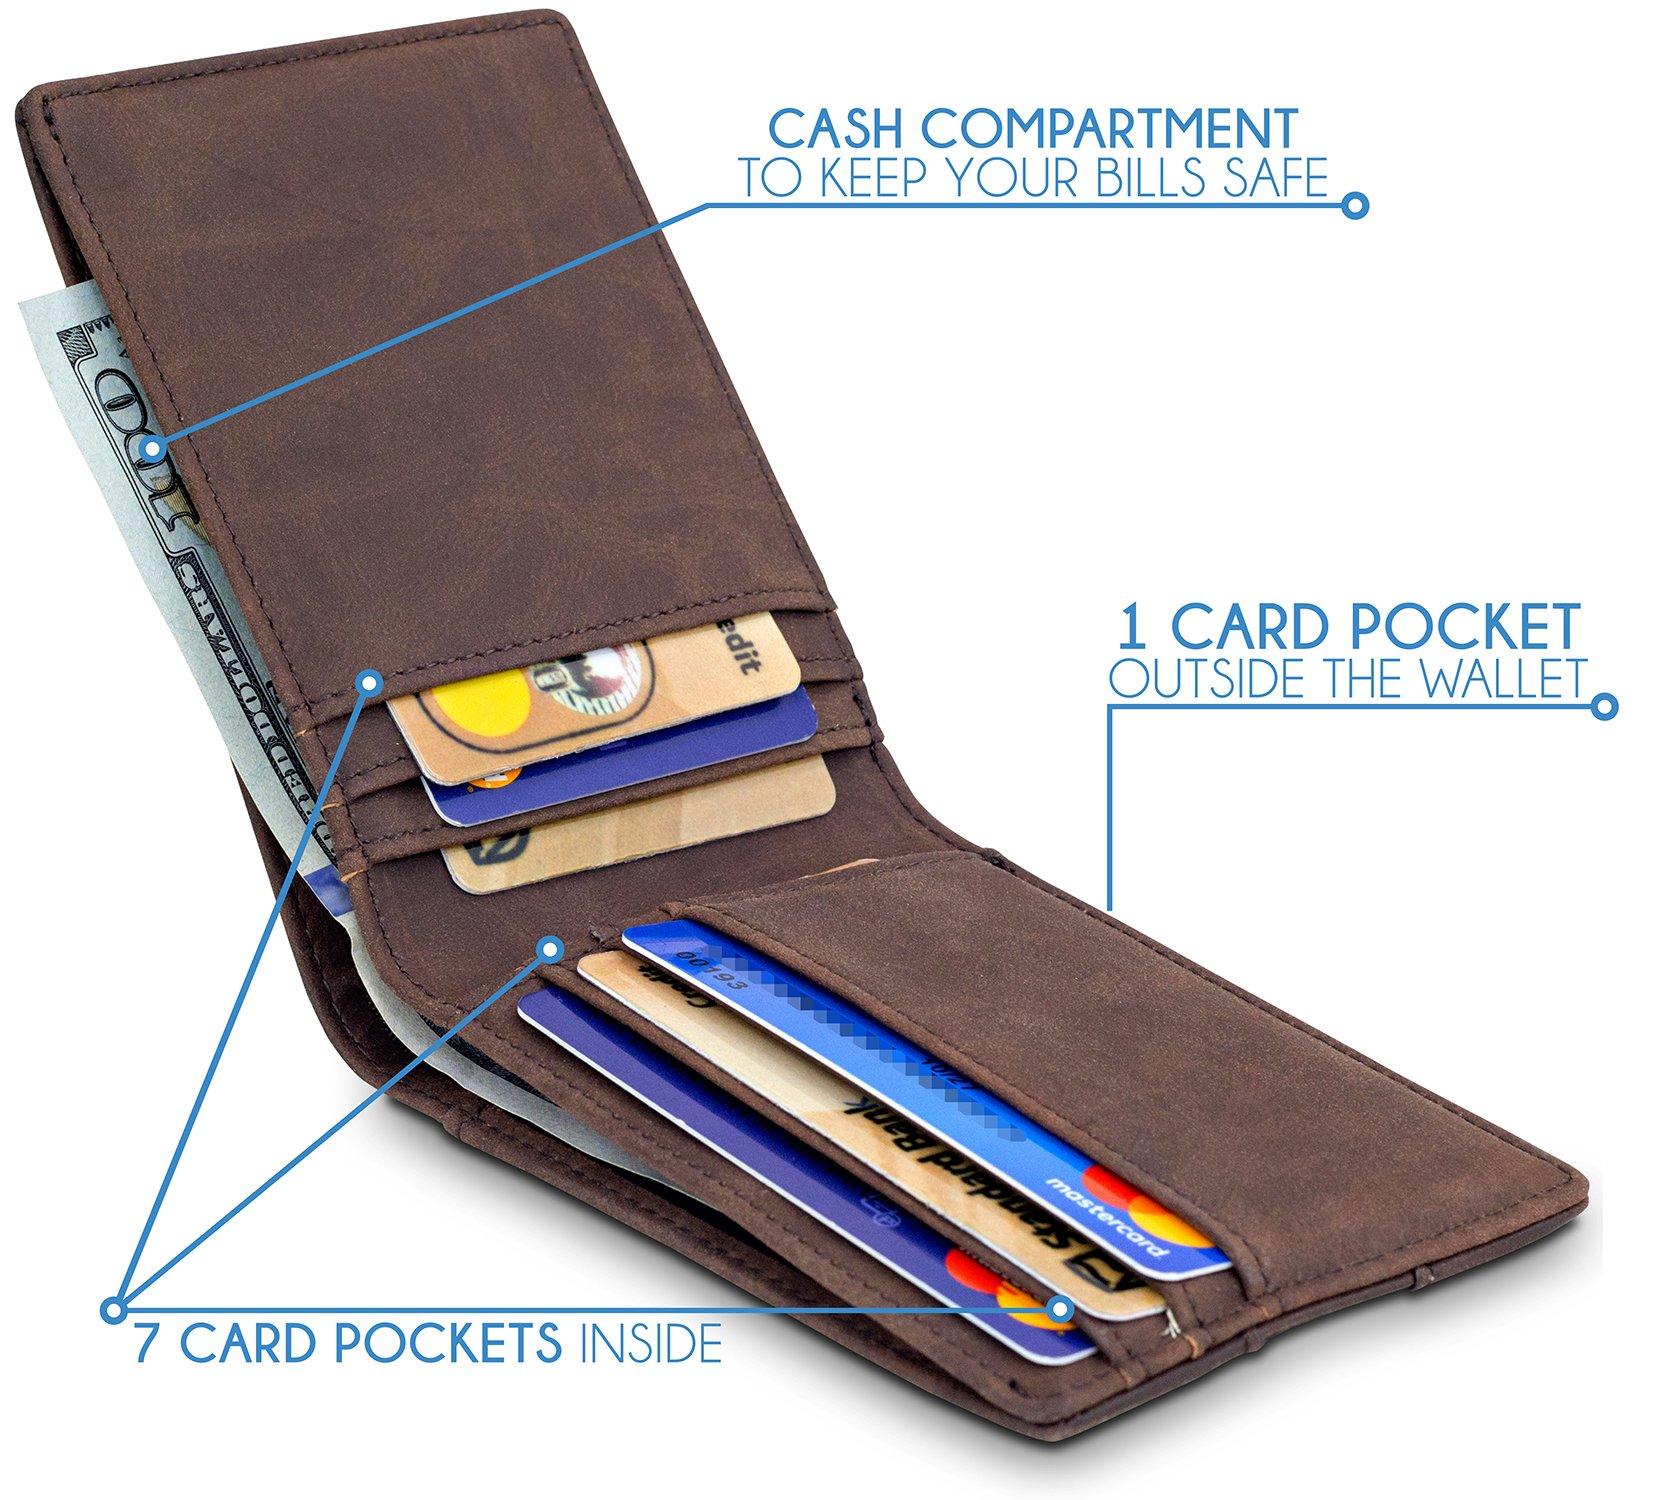 TRAVANDO Slim Wallets BUFFALO - RFID Blocking Wallet - 8 Card Pockets - Mini Credit Card Holder - Travel Wallet - Minimalist Bifold Wallet for Men with Gift Box by Travando (Image #2)